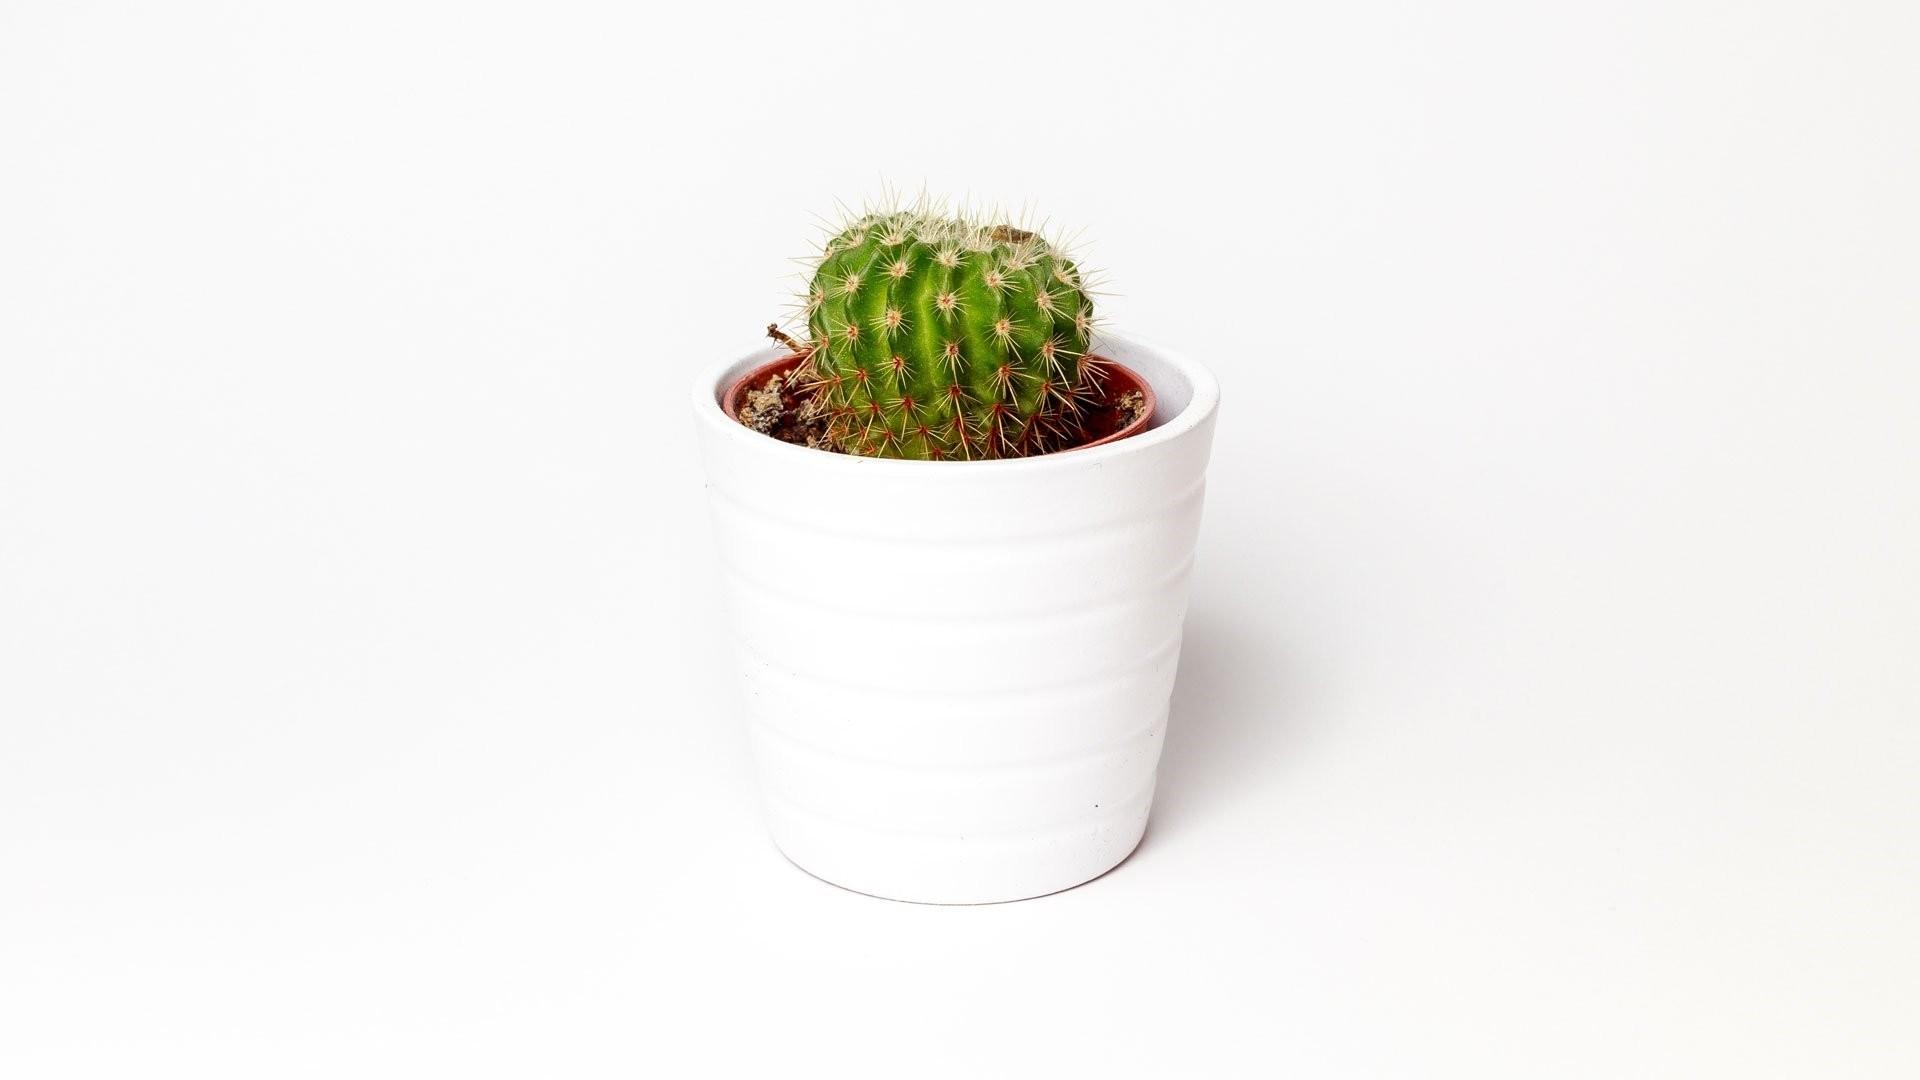 Cactus Minimalist HD Wallpaper